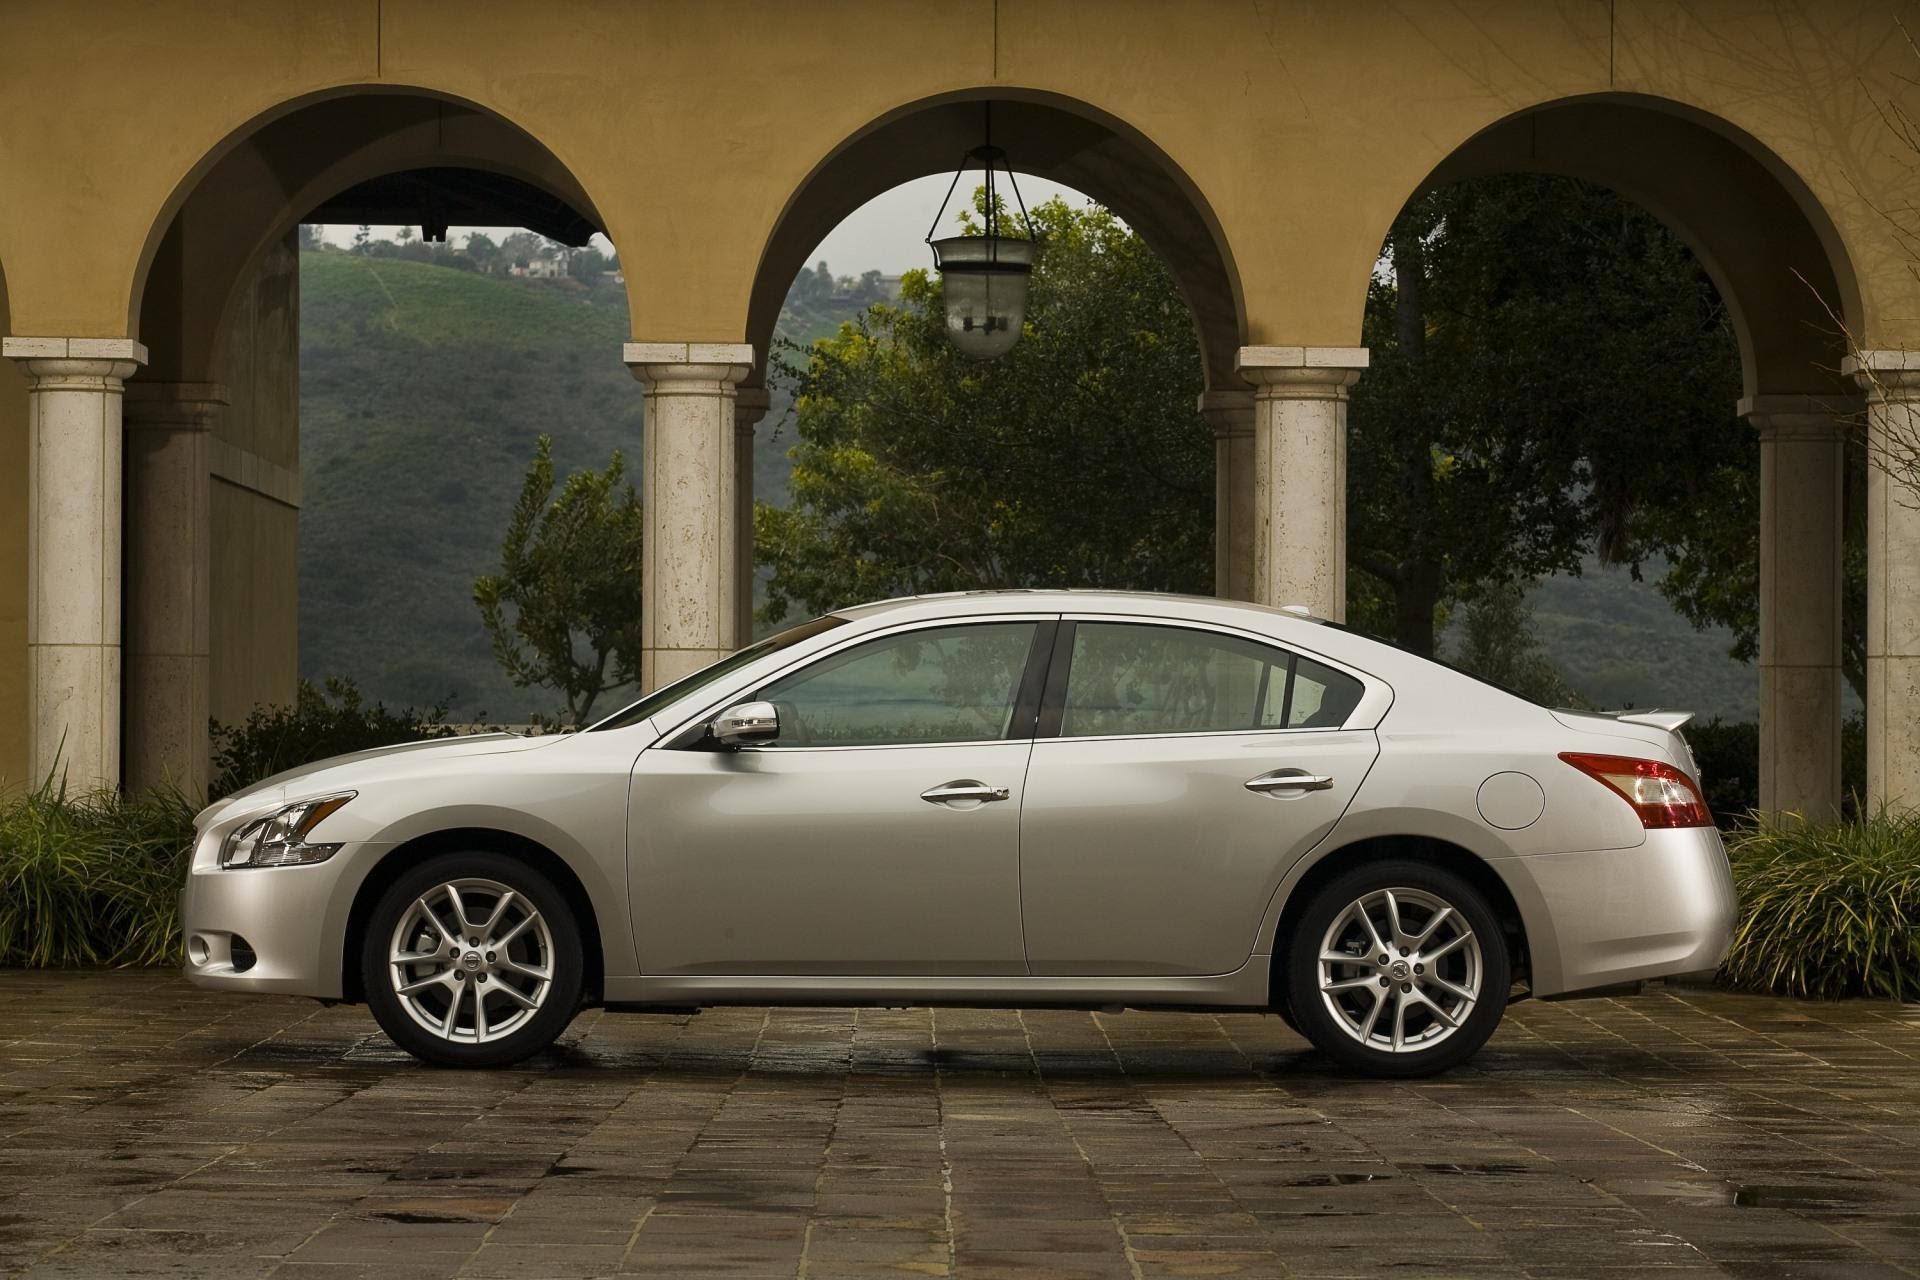 2010 Nissan Maxima News And Information Conceptcarz Com